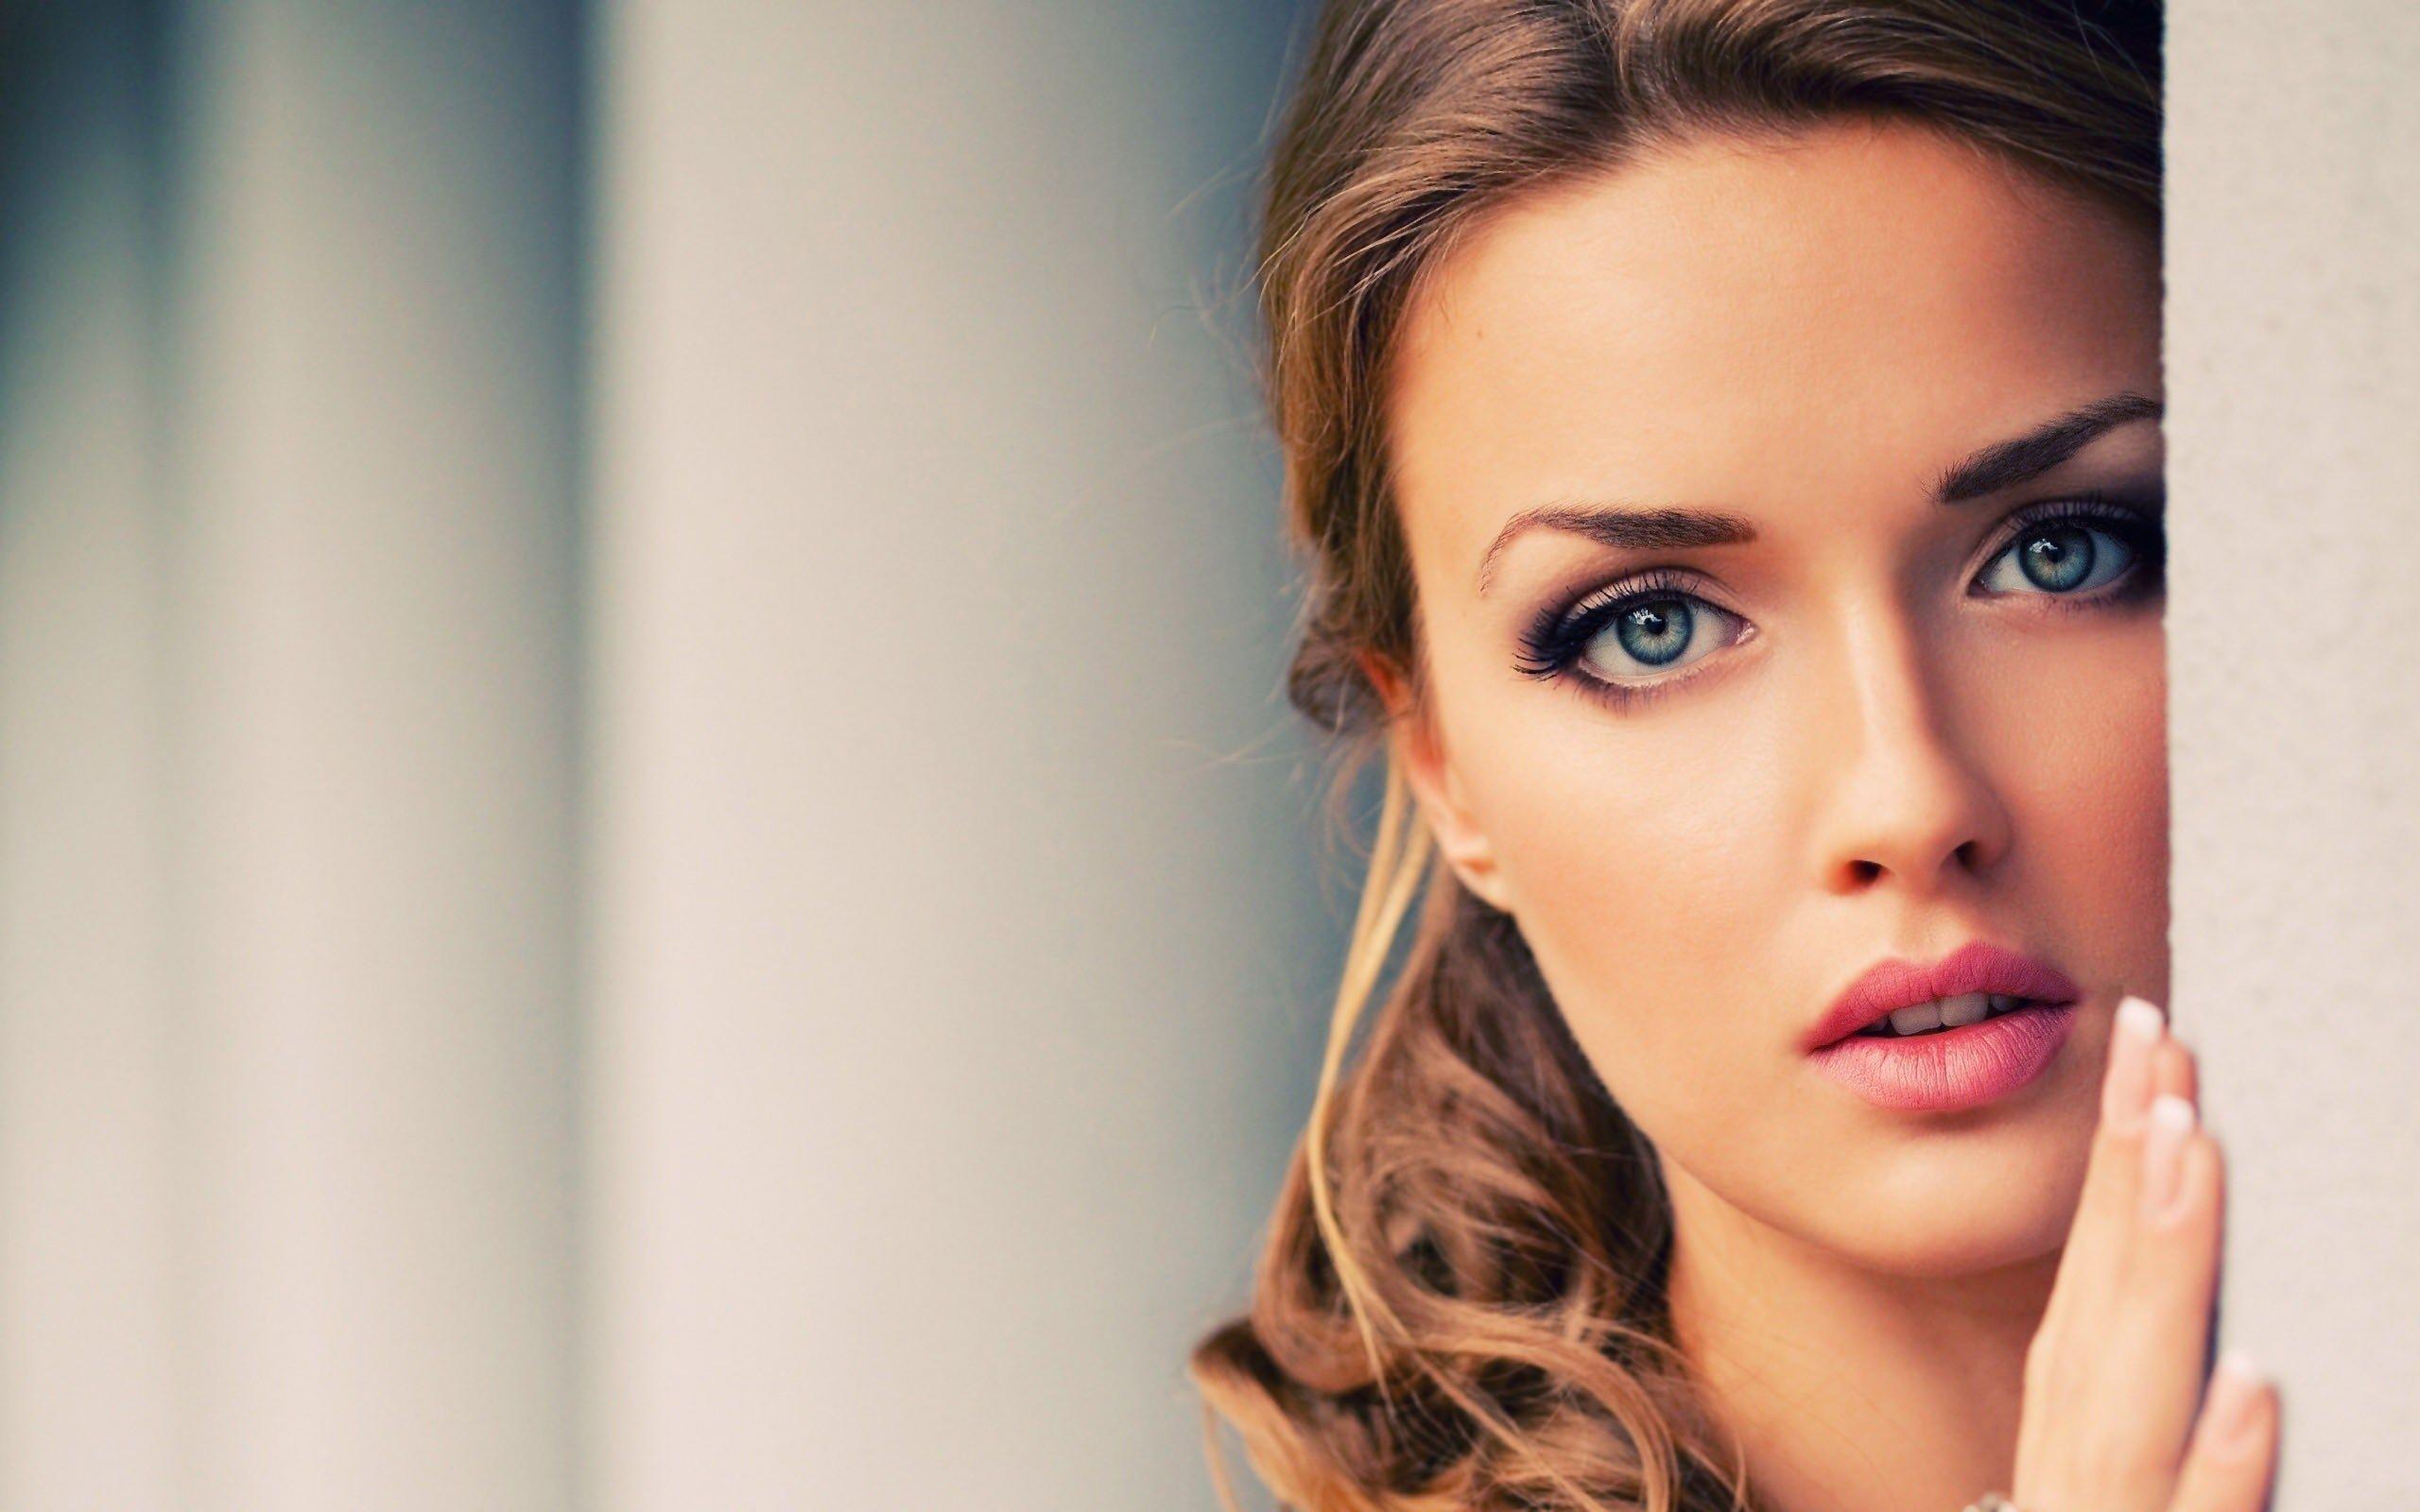 Beautiful Women Faces Wallpaper 54 Images